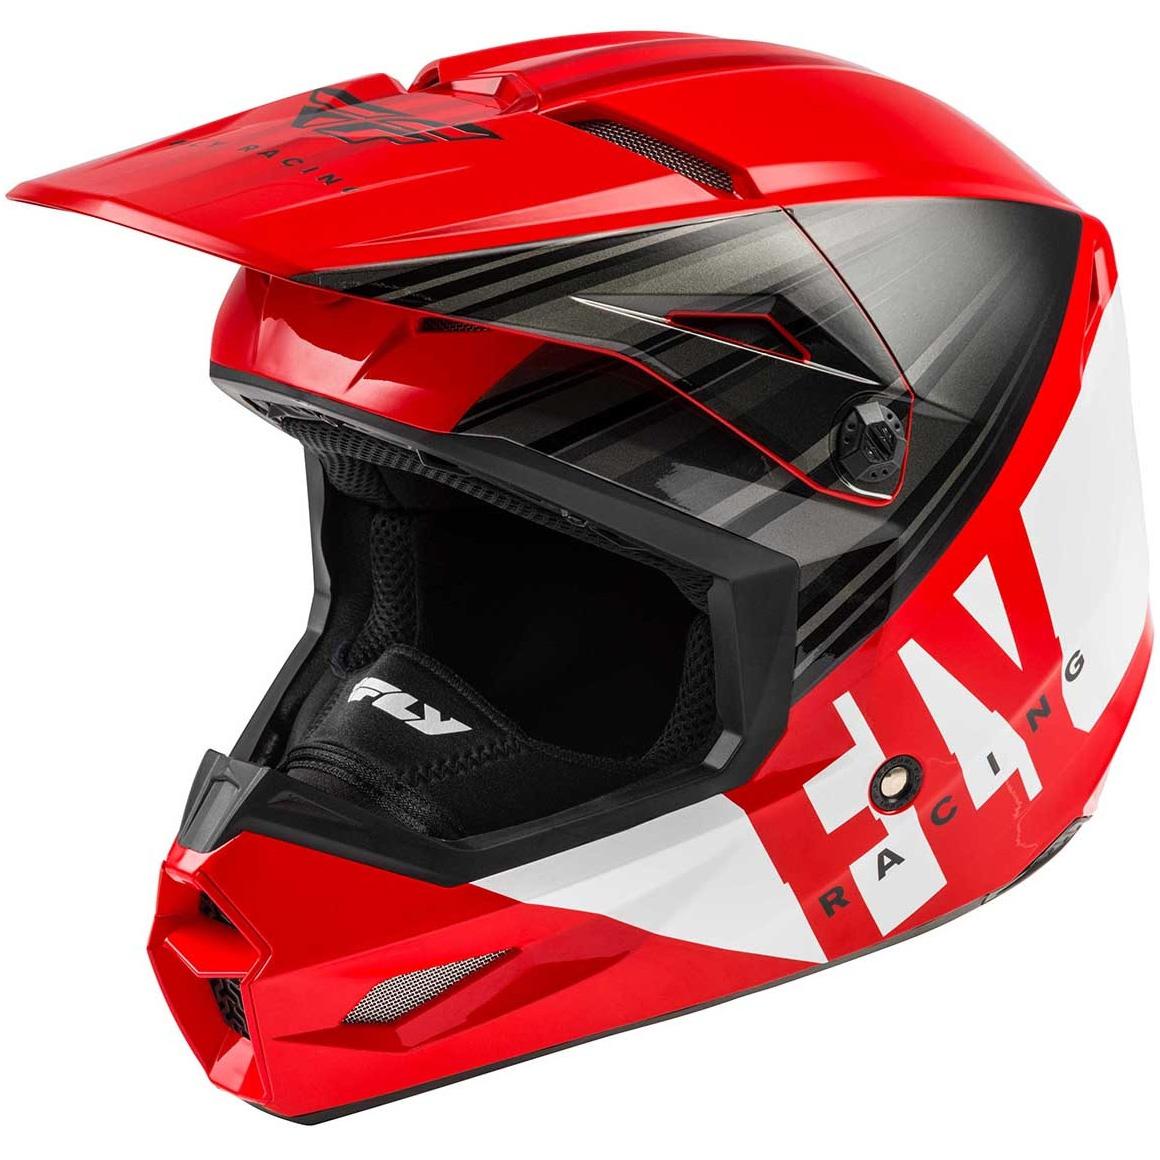 Fly Racing - 2020 Kinetic K220 шлем, красно-черно-белый